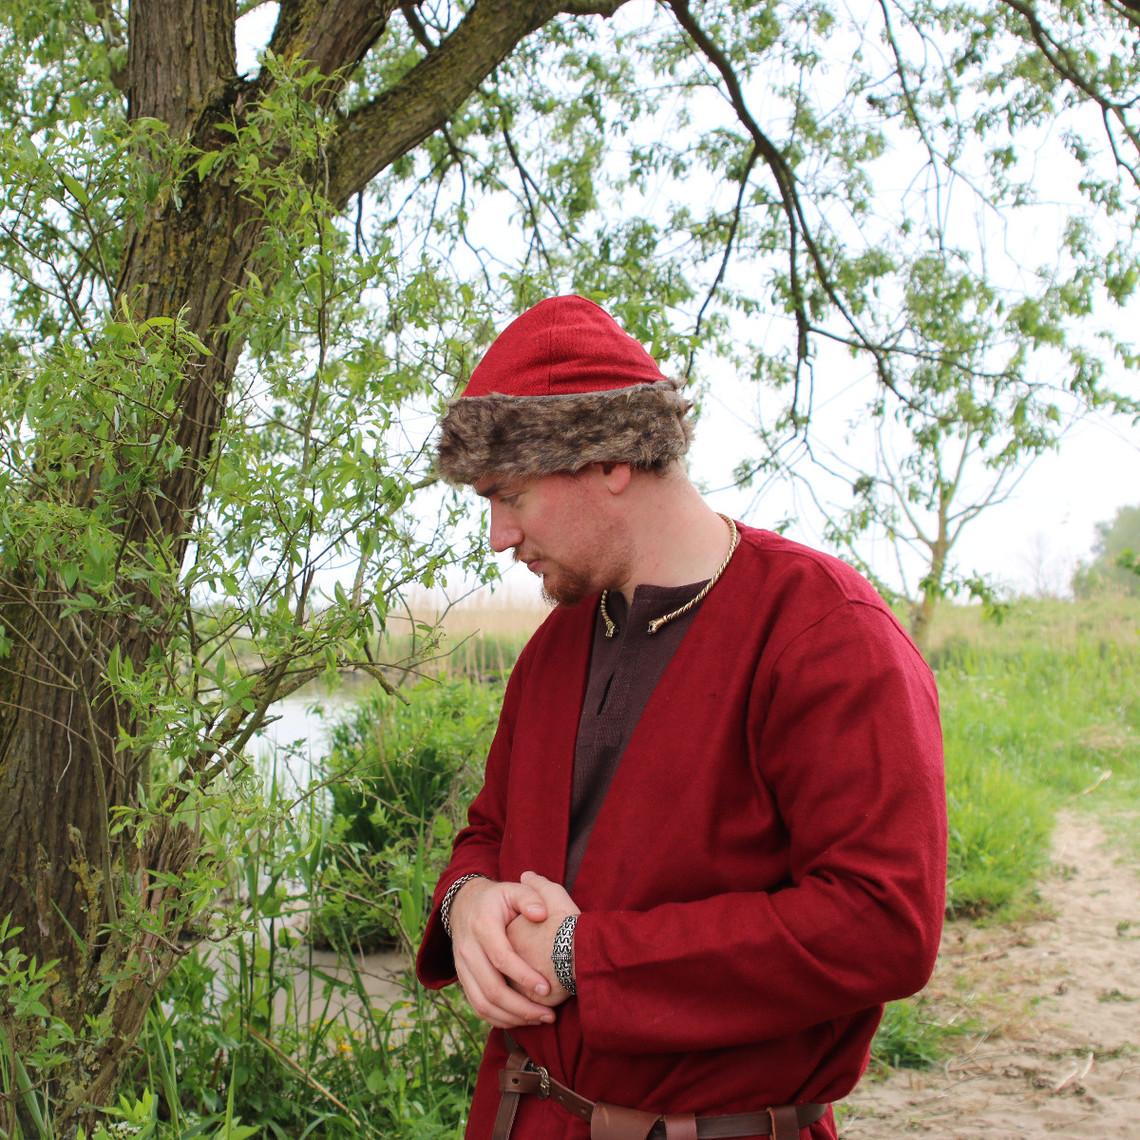 Leonardo Carbone Birka Viking hat, red